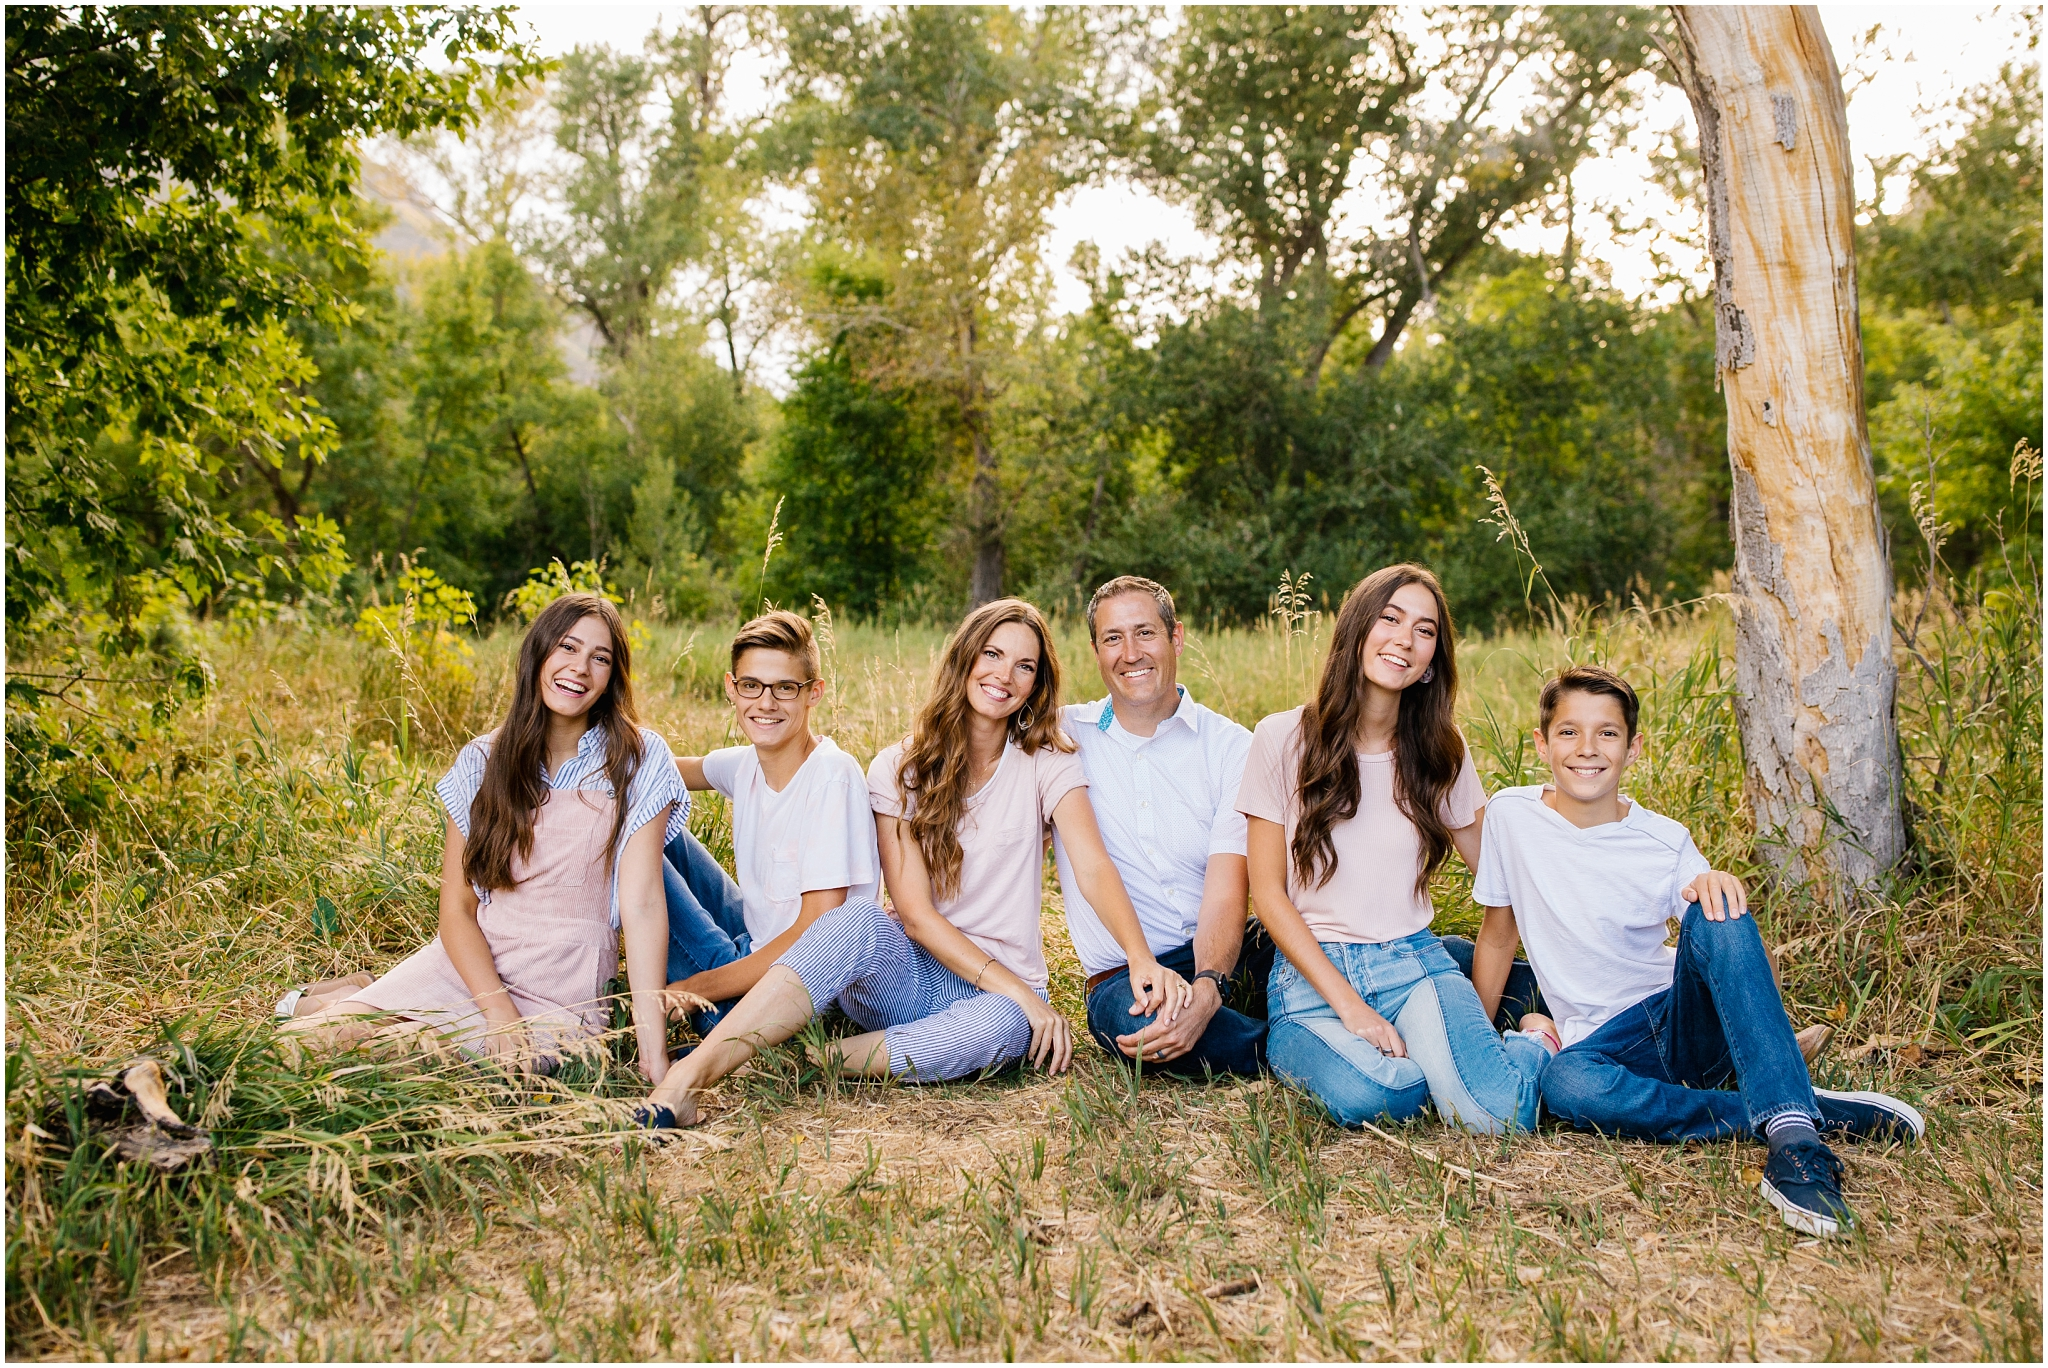 Overly-15_Lizzie-B-Imagery-Utah-Family-Photographer-Salt-Lake-City-Park-City-Utah-County-Hobble-Creek-Canyon-Jolleys-Ranch.jpg